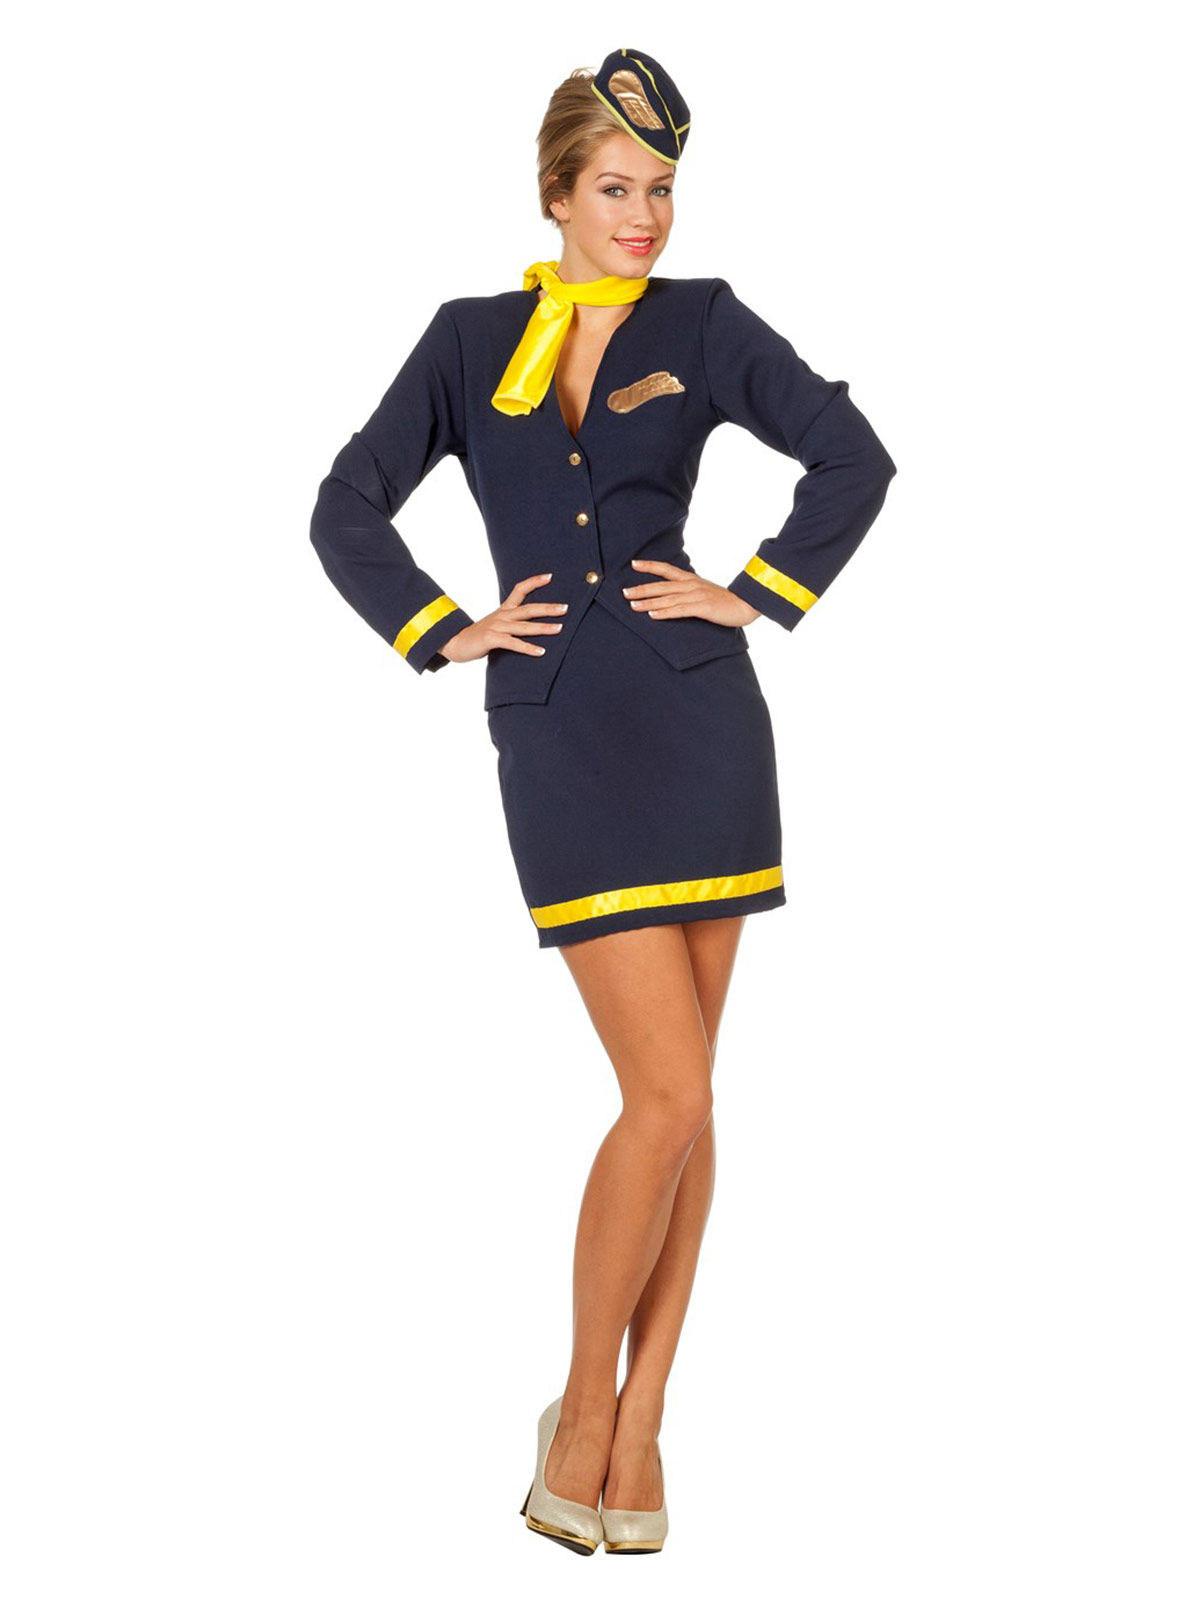 1556db0880224 Sexy Retro Stewardess Damenkostüm dunkelblau-gelb , günstige ...